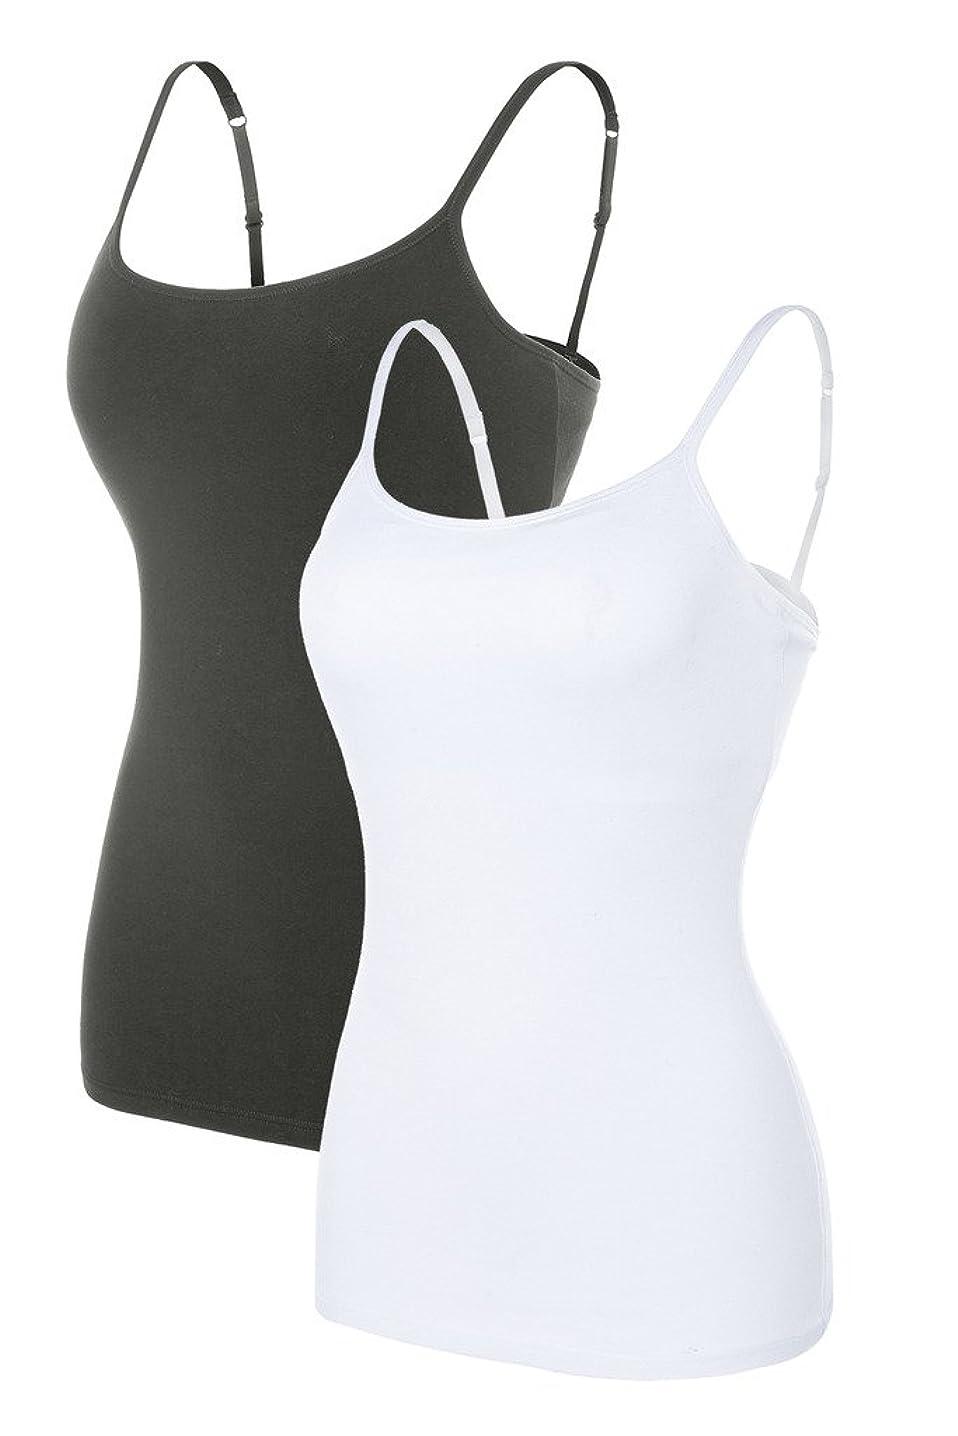 CharmLeaks Womens Cotton Camisole Shelf Bra Cami Tank Top Strechy Undershirts 2 Pack